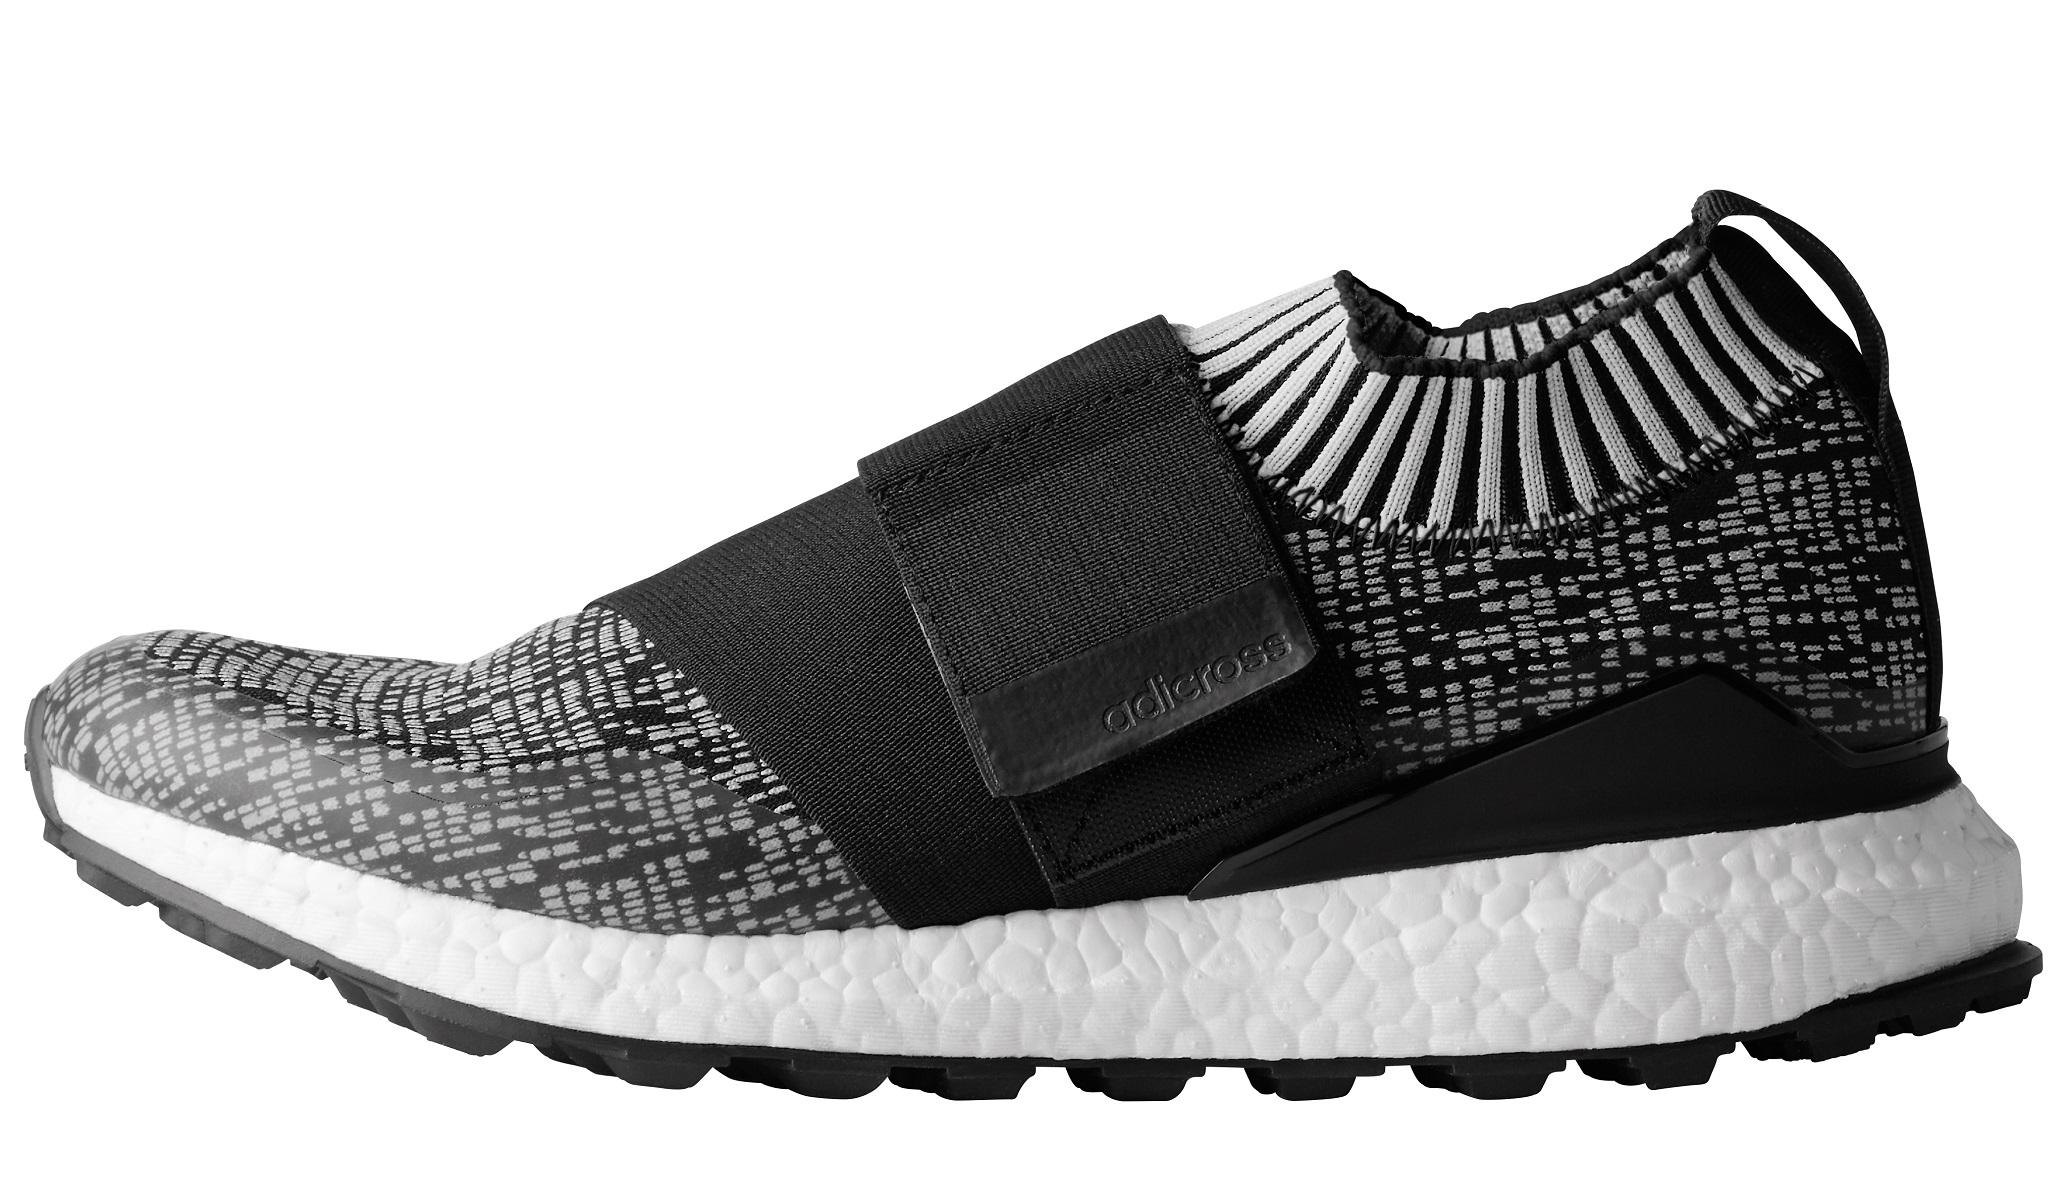 buy popular a5aed 58851 Adidas Crossknit 2.0 Shoes  RockBottomGolf.com